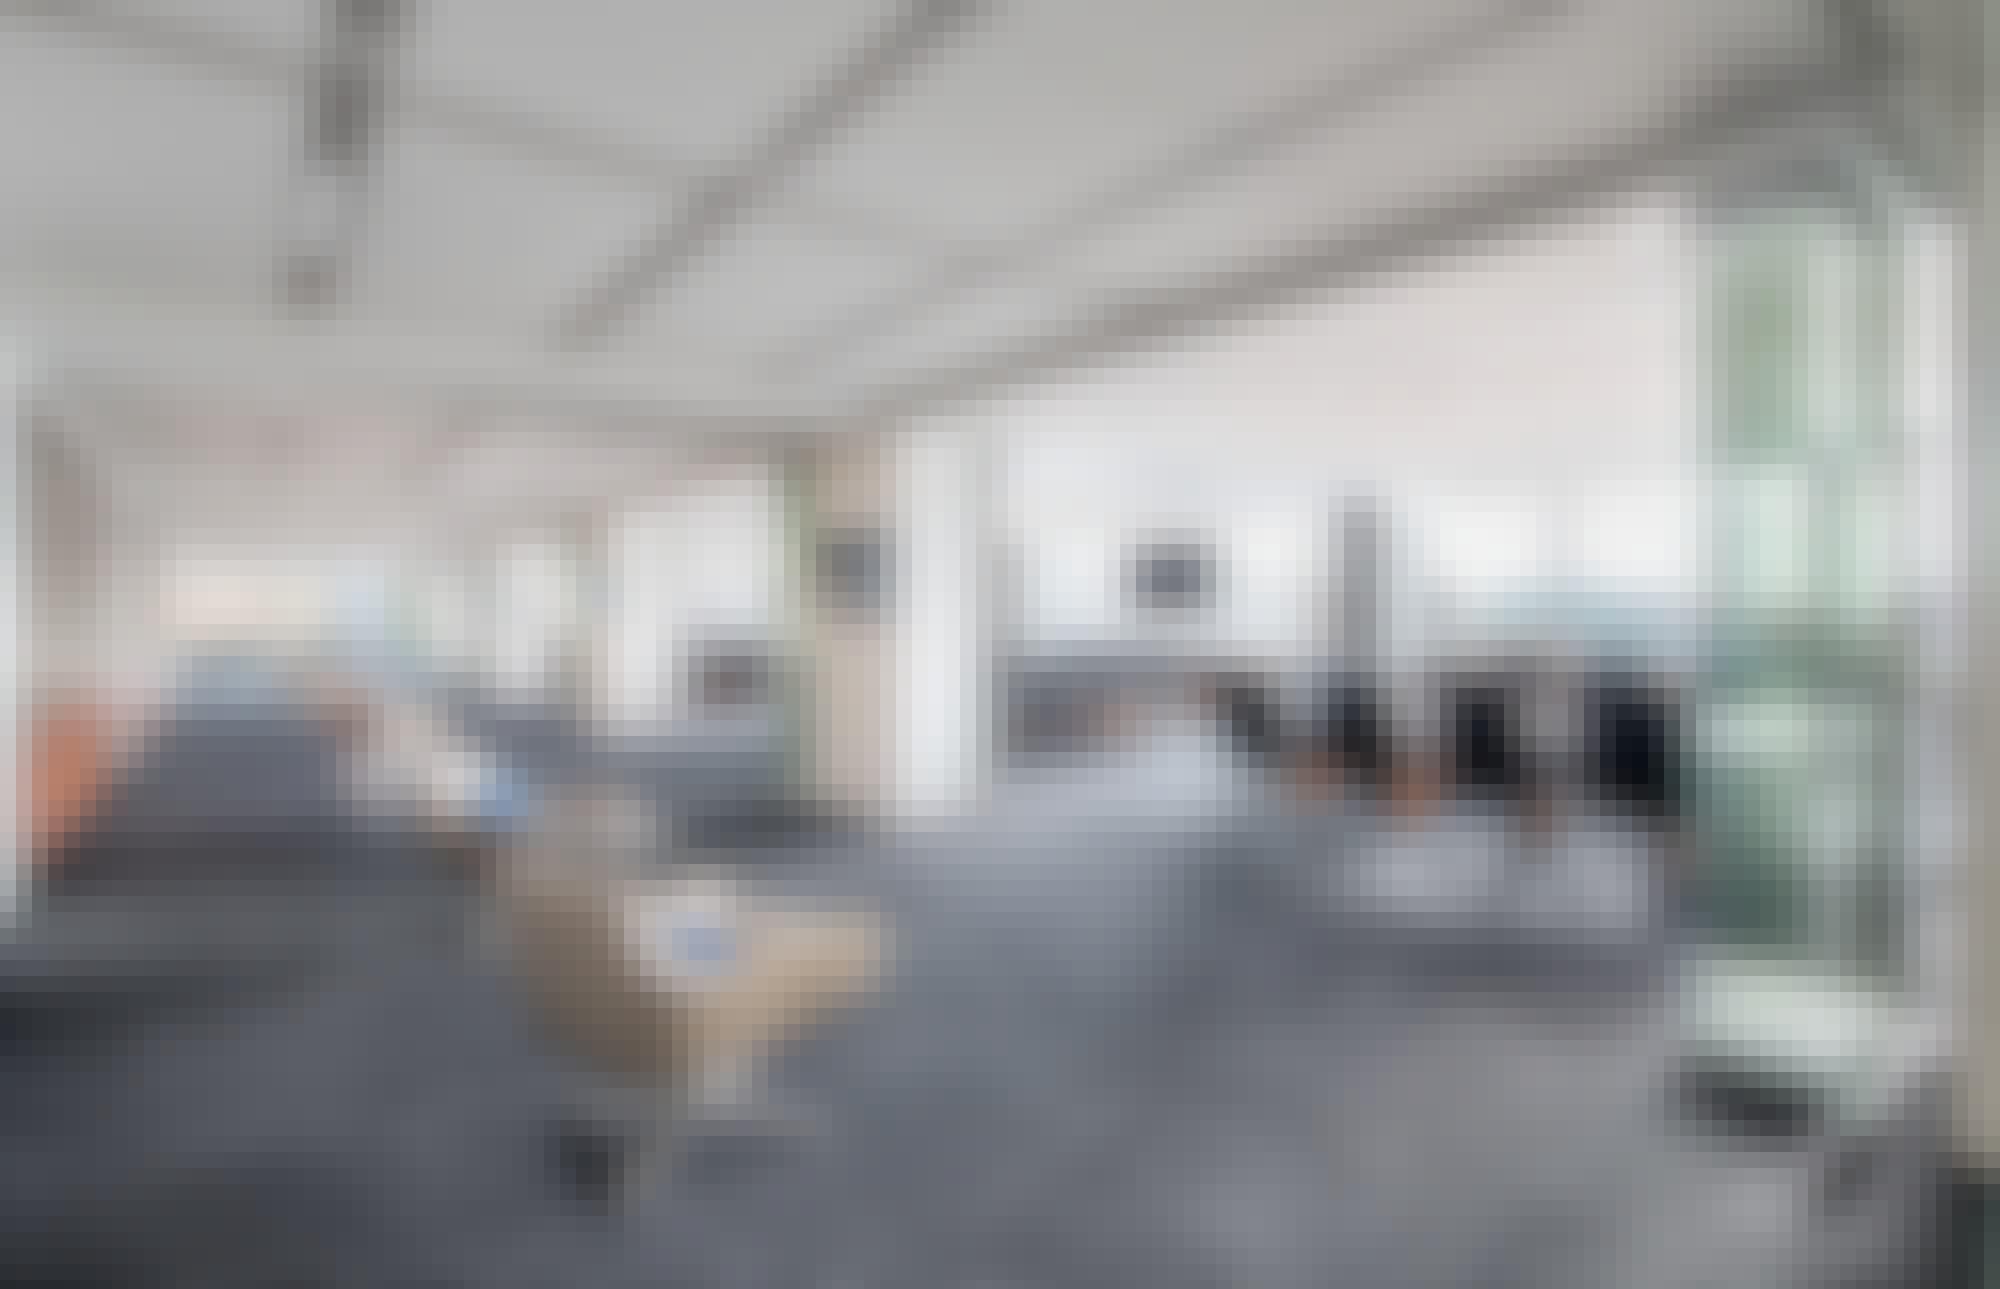 open-single-track-sliding-system-in-office